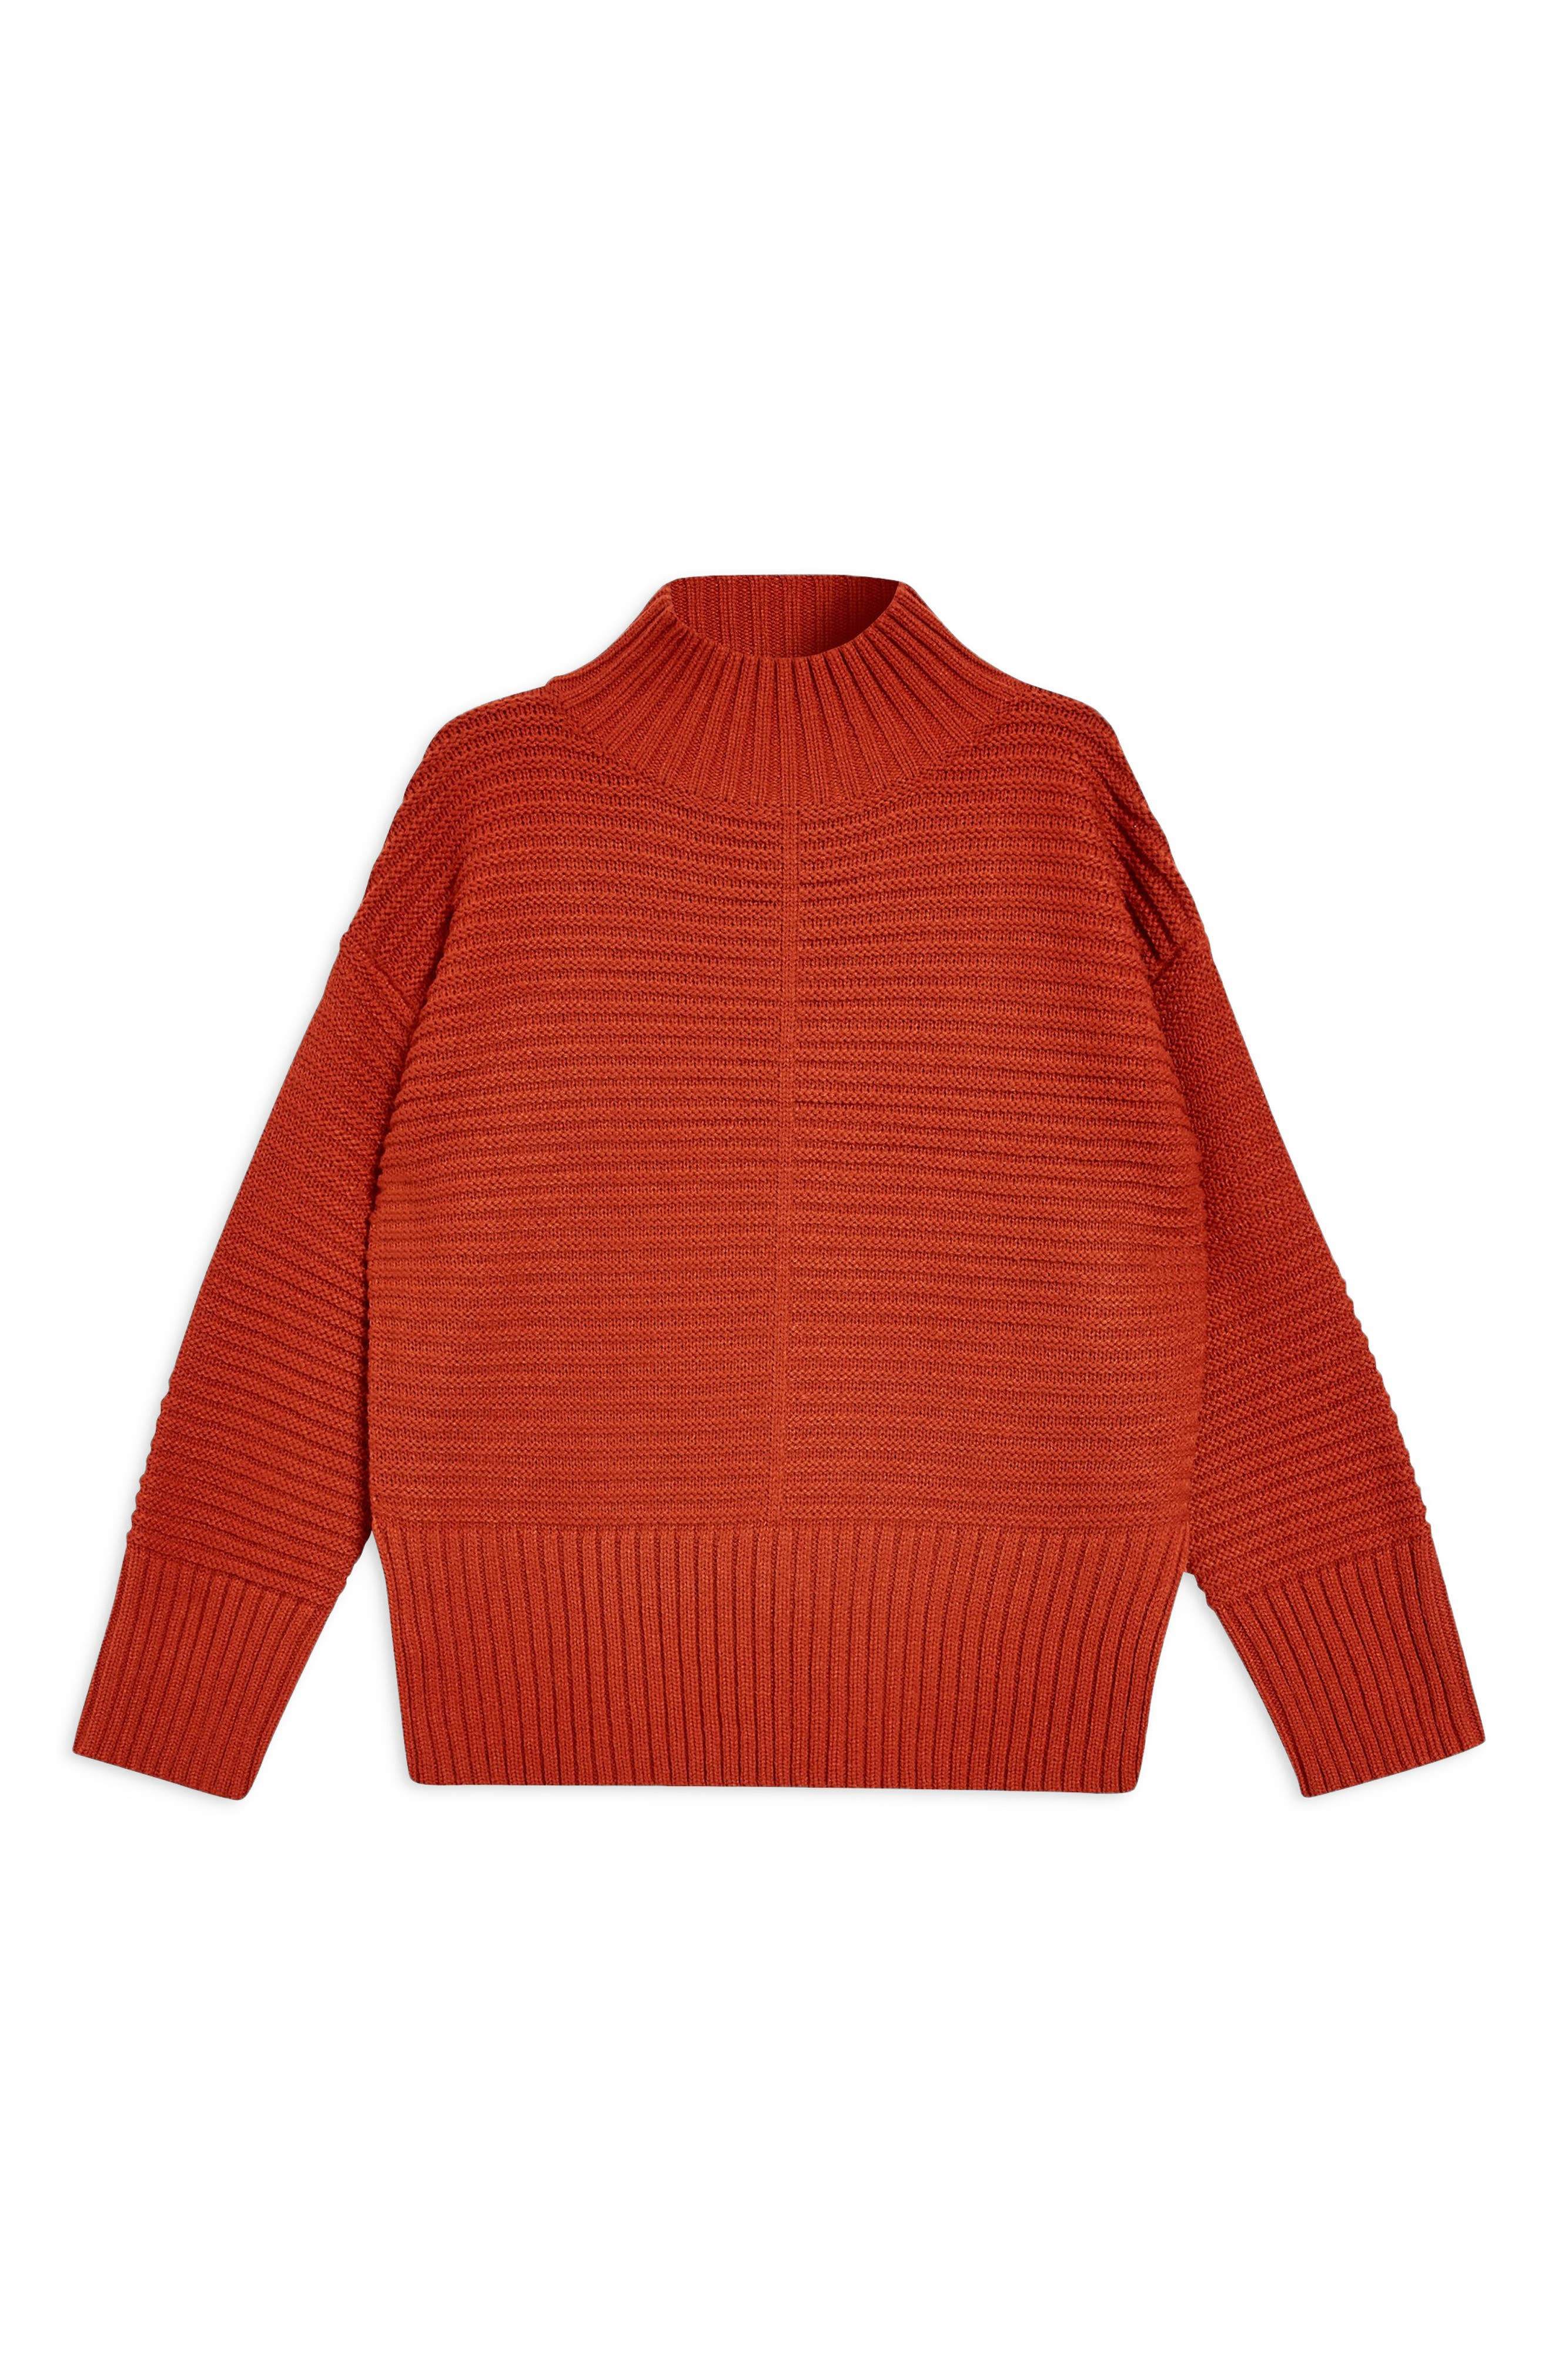 TOPSHOP, Mock Neck Sweater, Alternate thumbnail 5, color, RUST